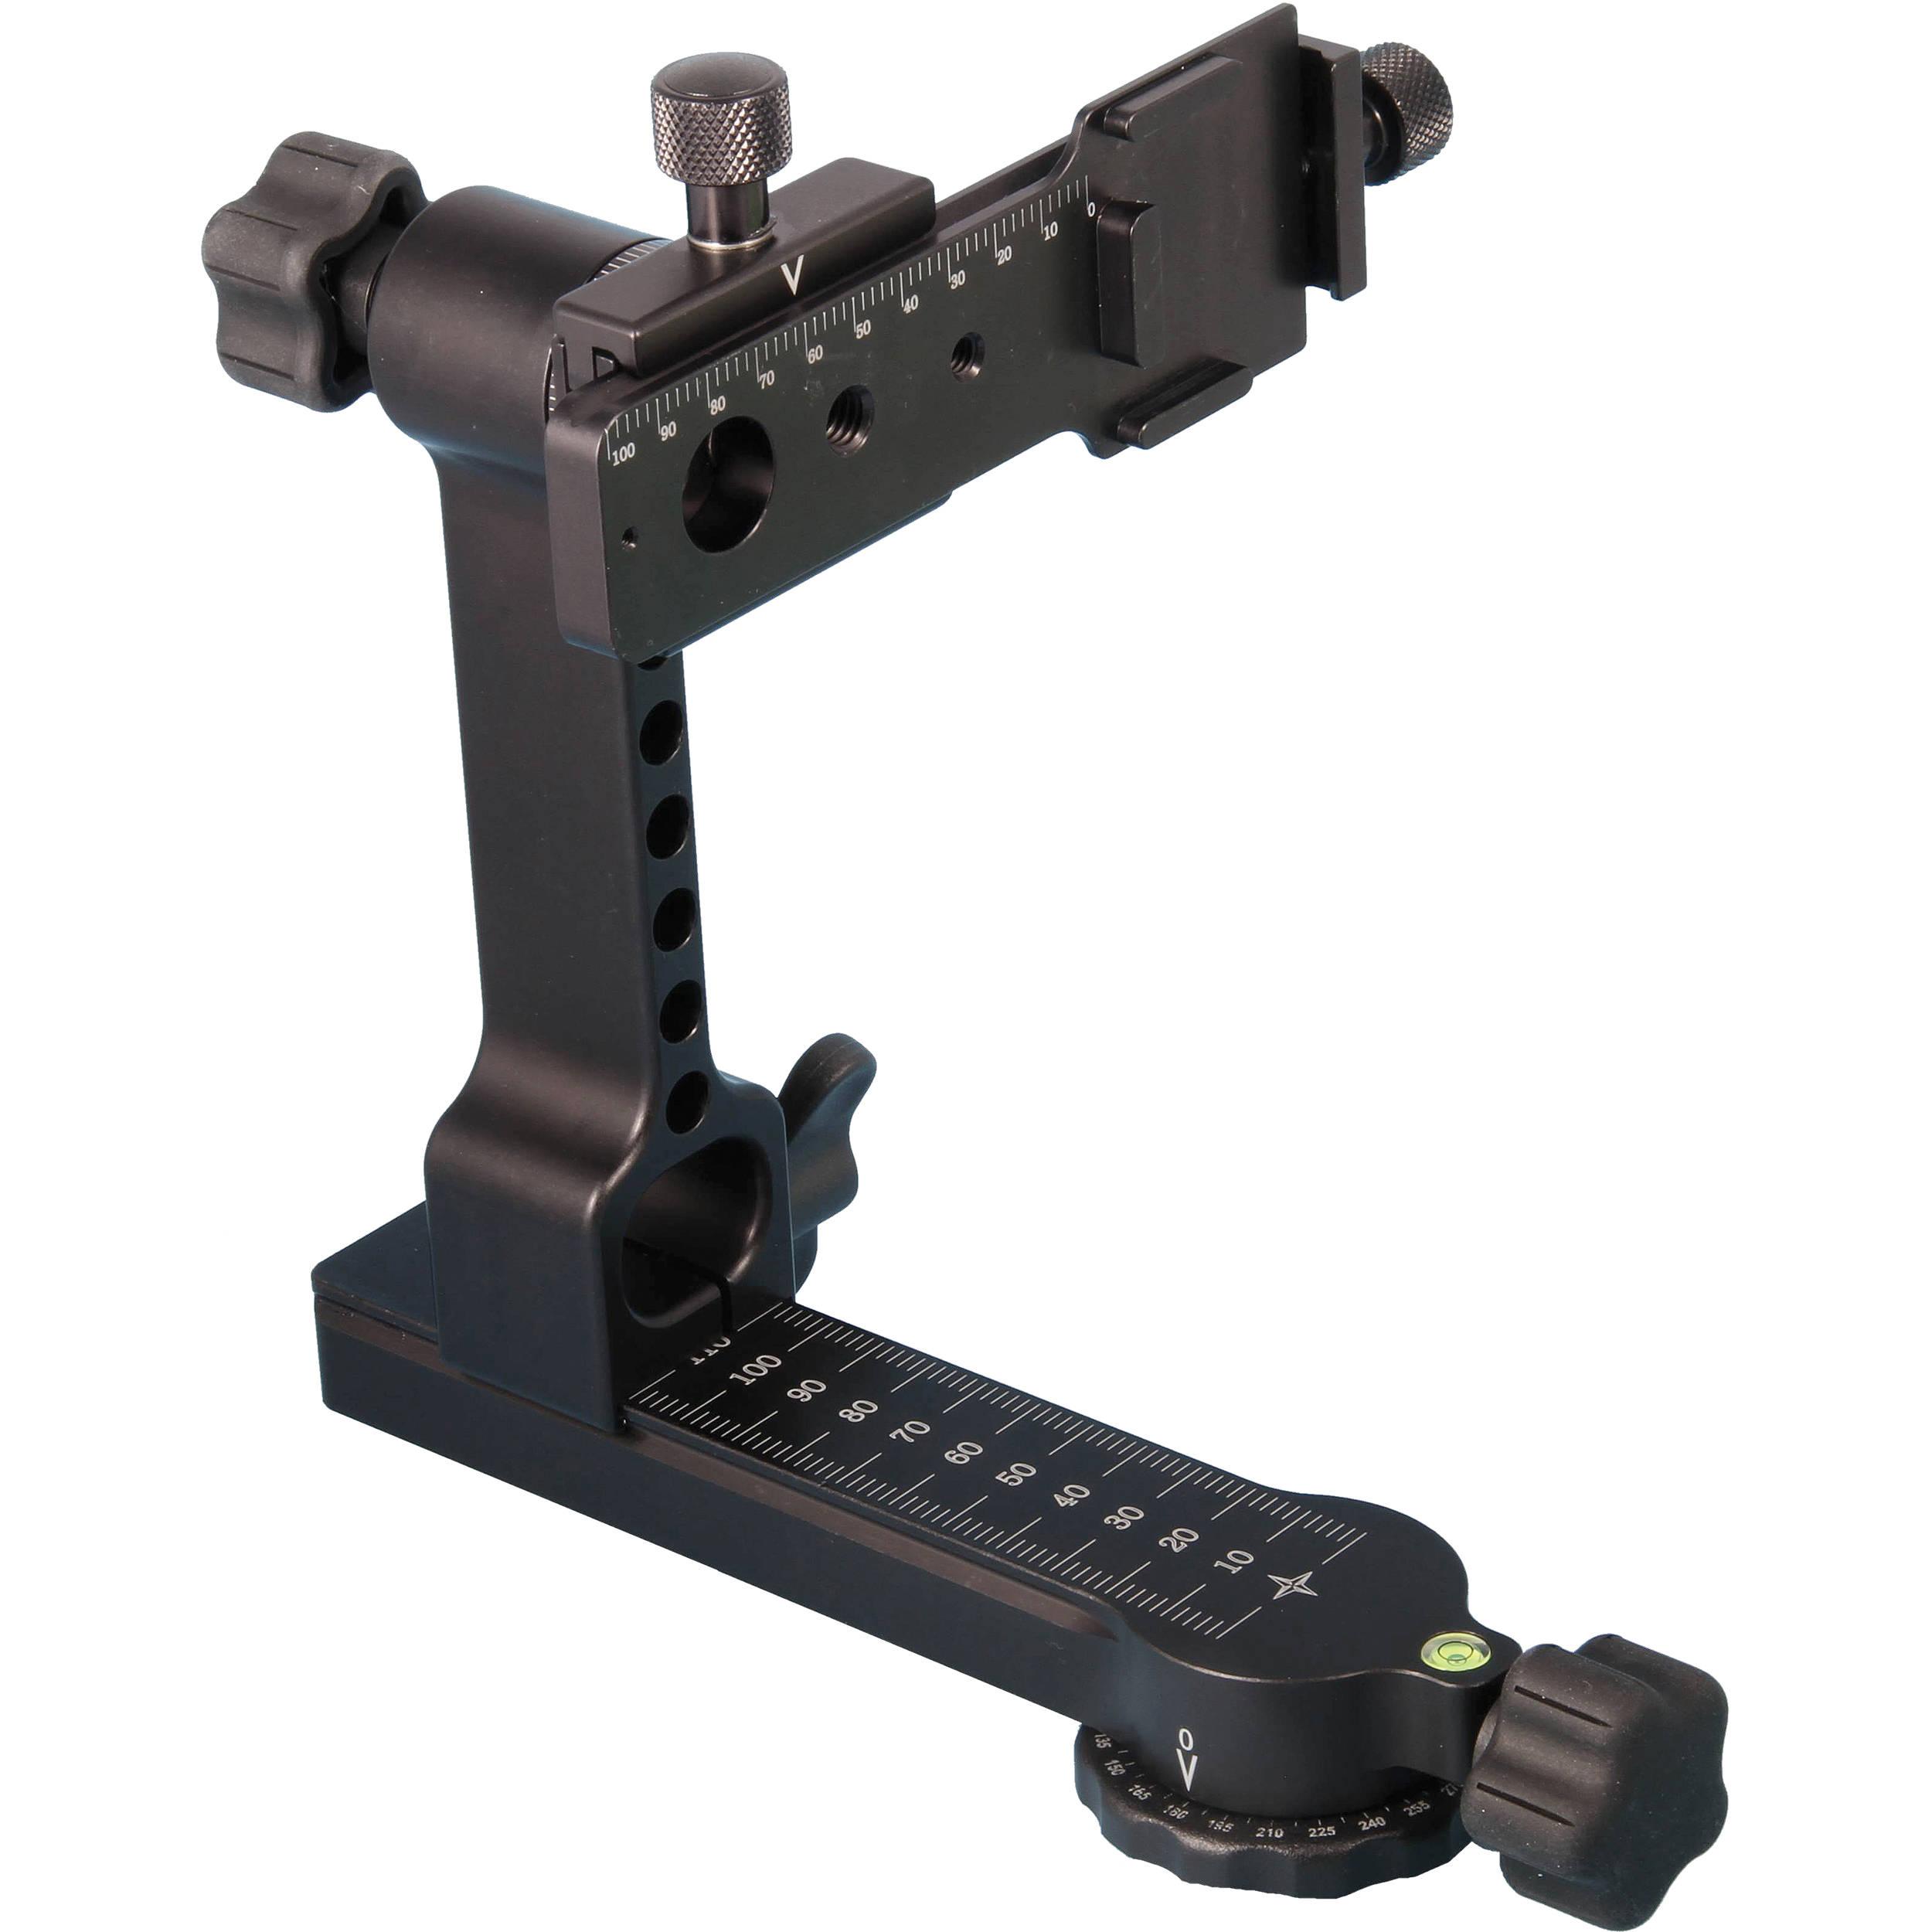 Light Stand Gimbal: Jobu Design Manfrotto-Compatible Panoramic Gimbal Head PGH-KM1